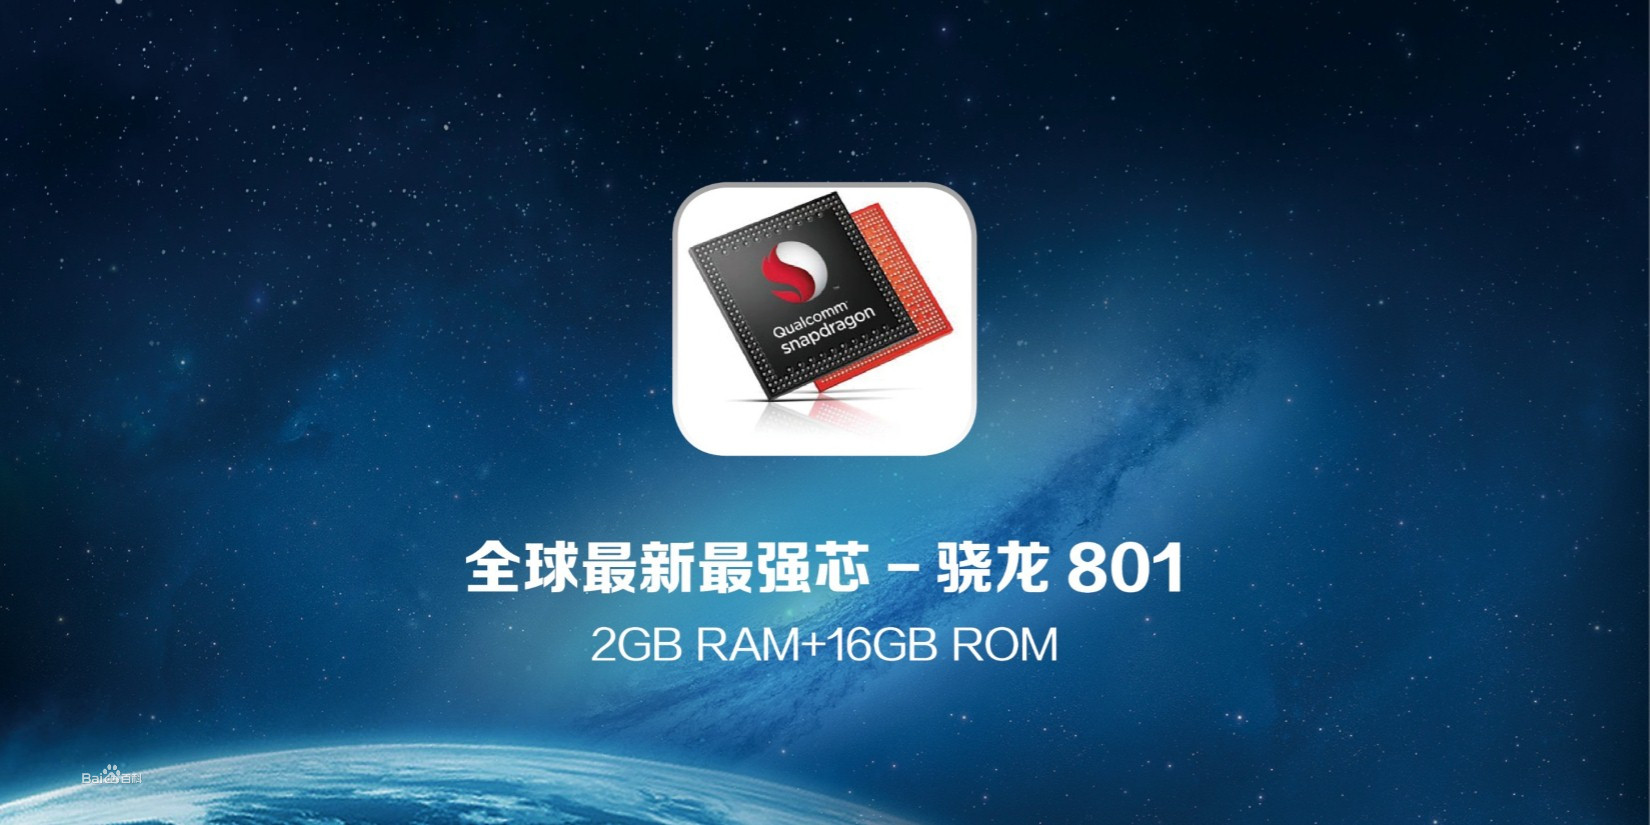 晓龙801顶级核芯